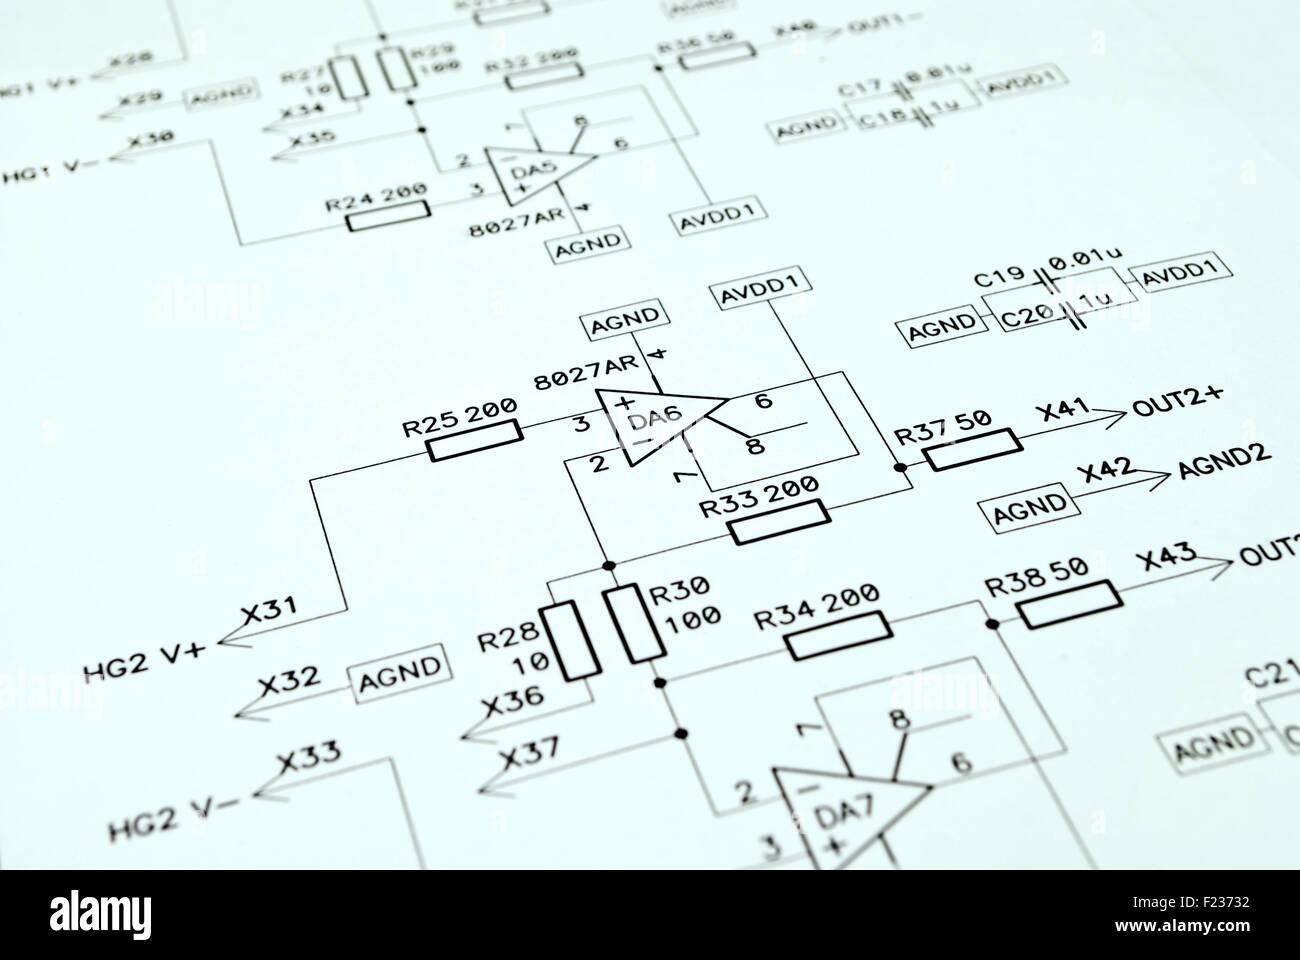 Schematic Drawing Stockfotos & Schematic Drawing Bilder - Alamy